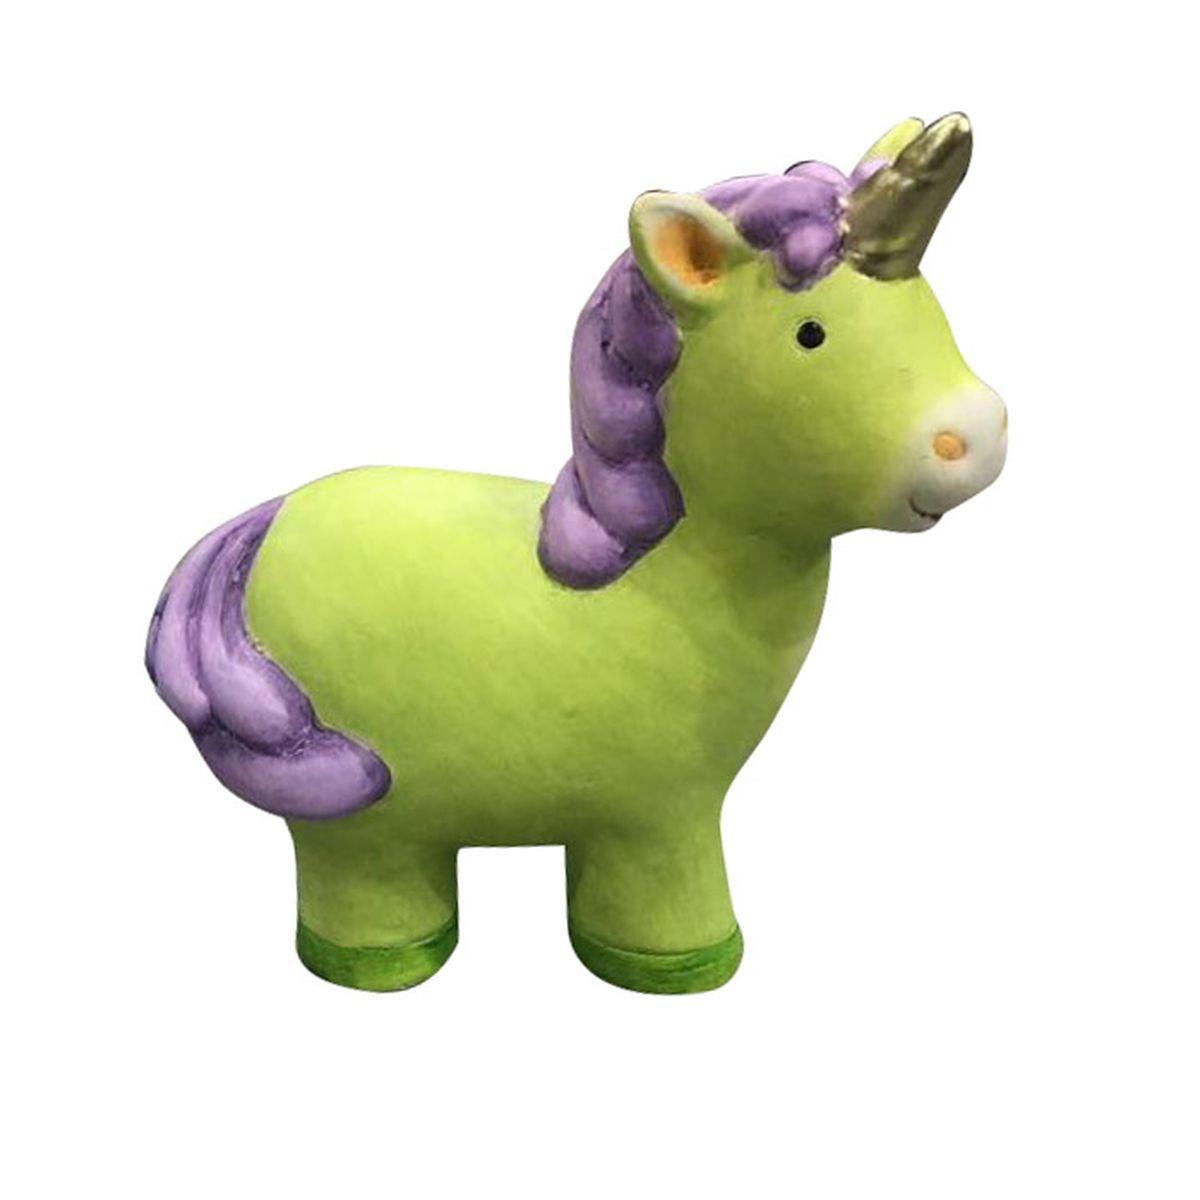 Фигурка декоративная Village People Салатовый единорог, фиолетовый, зеленый, 15 х 13,5 х 7 см цены онлайн